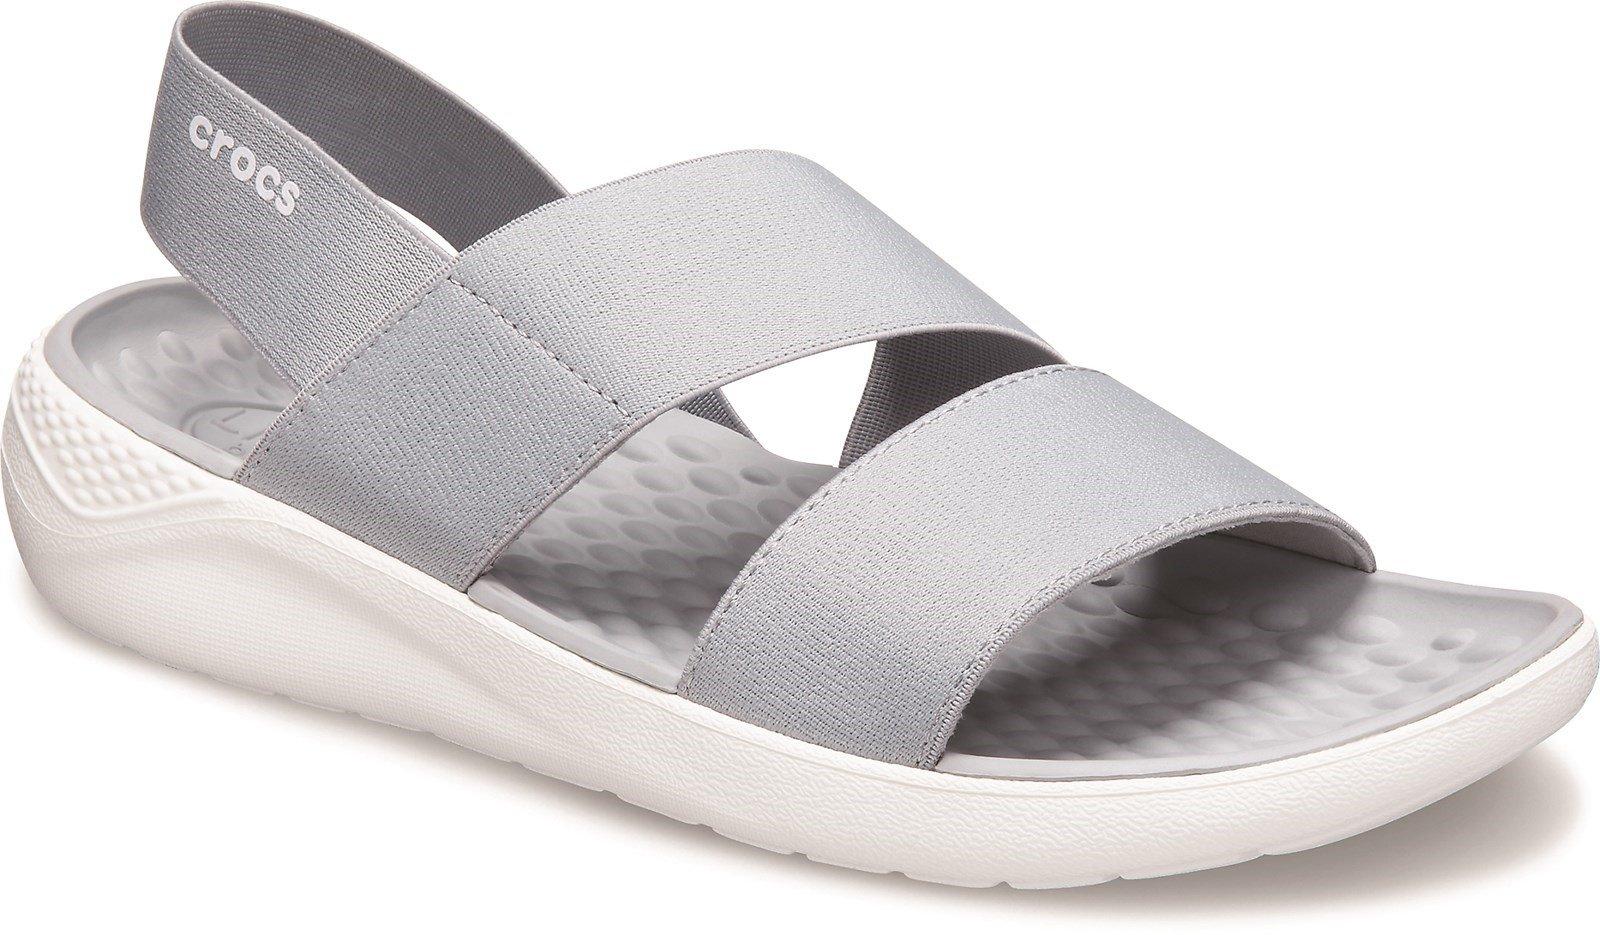 Crocs Women's Lite Ride Stretch Slip On Sandal Various Colours 31455 - Light Grey 3